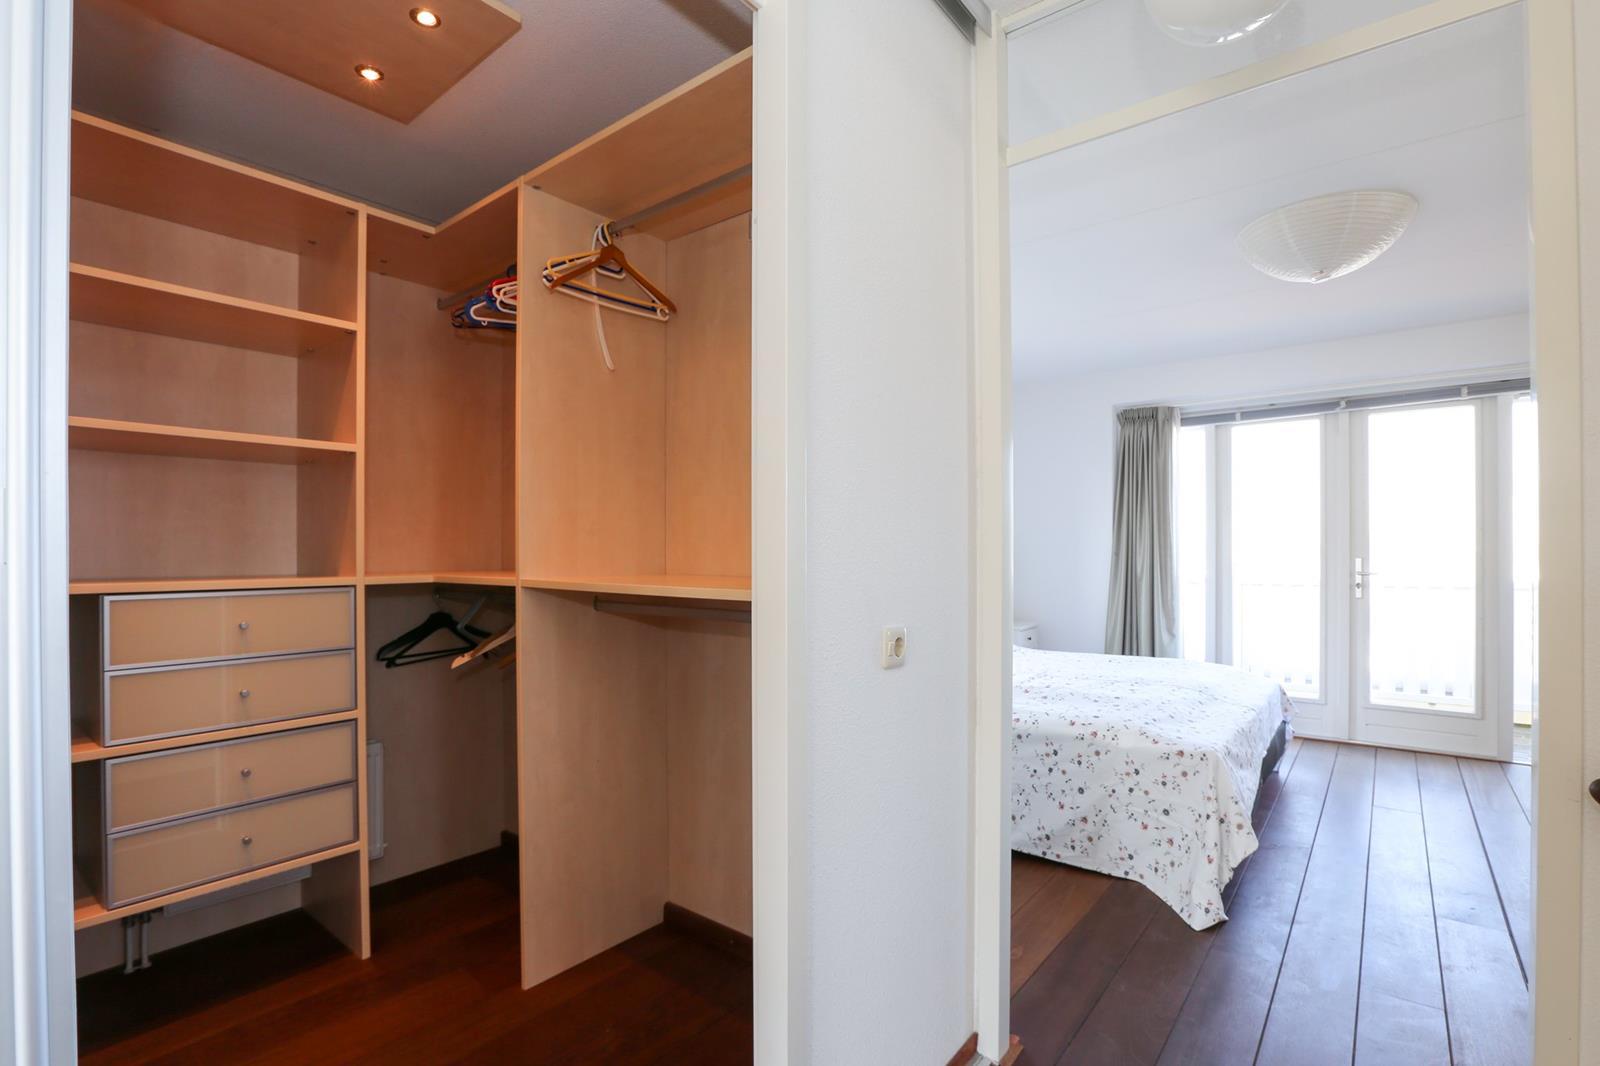 Vakantiehuis te koop aan water in Zuid-Holland 039.jpg